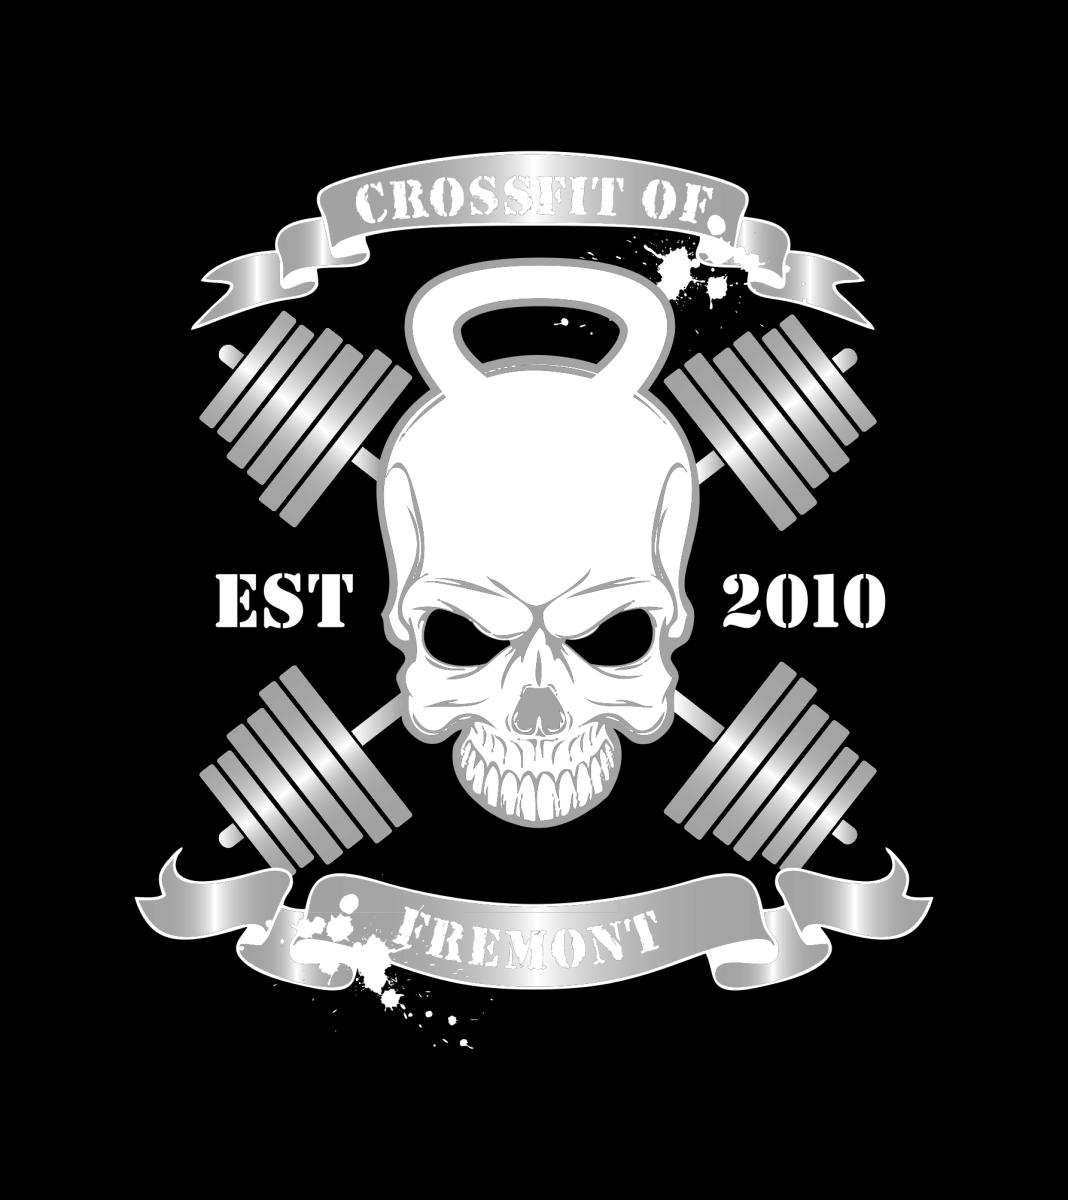 Crossfit of fremont crossfit of fremont logo xflitez Images